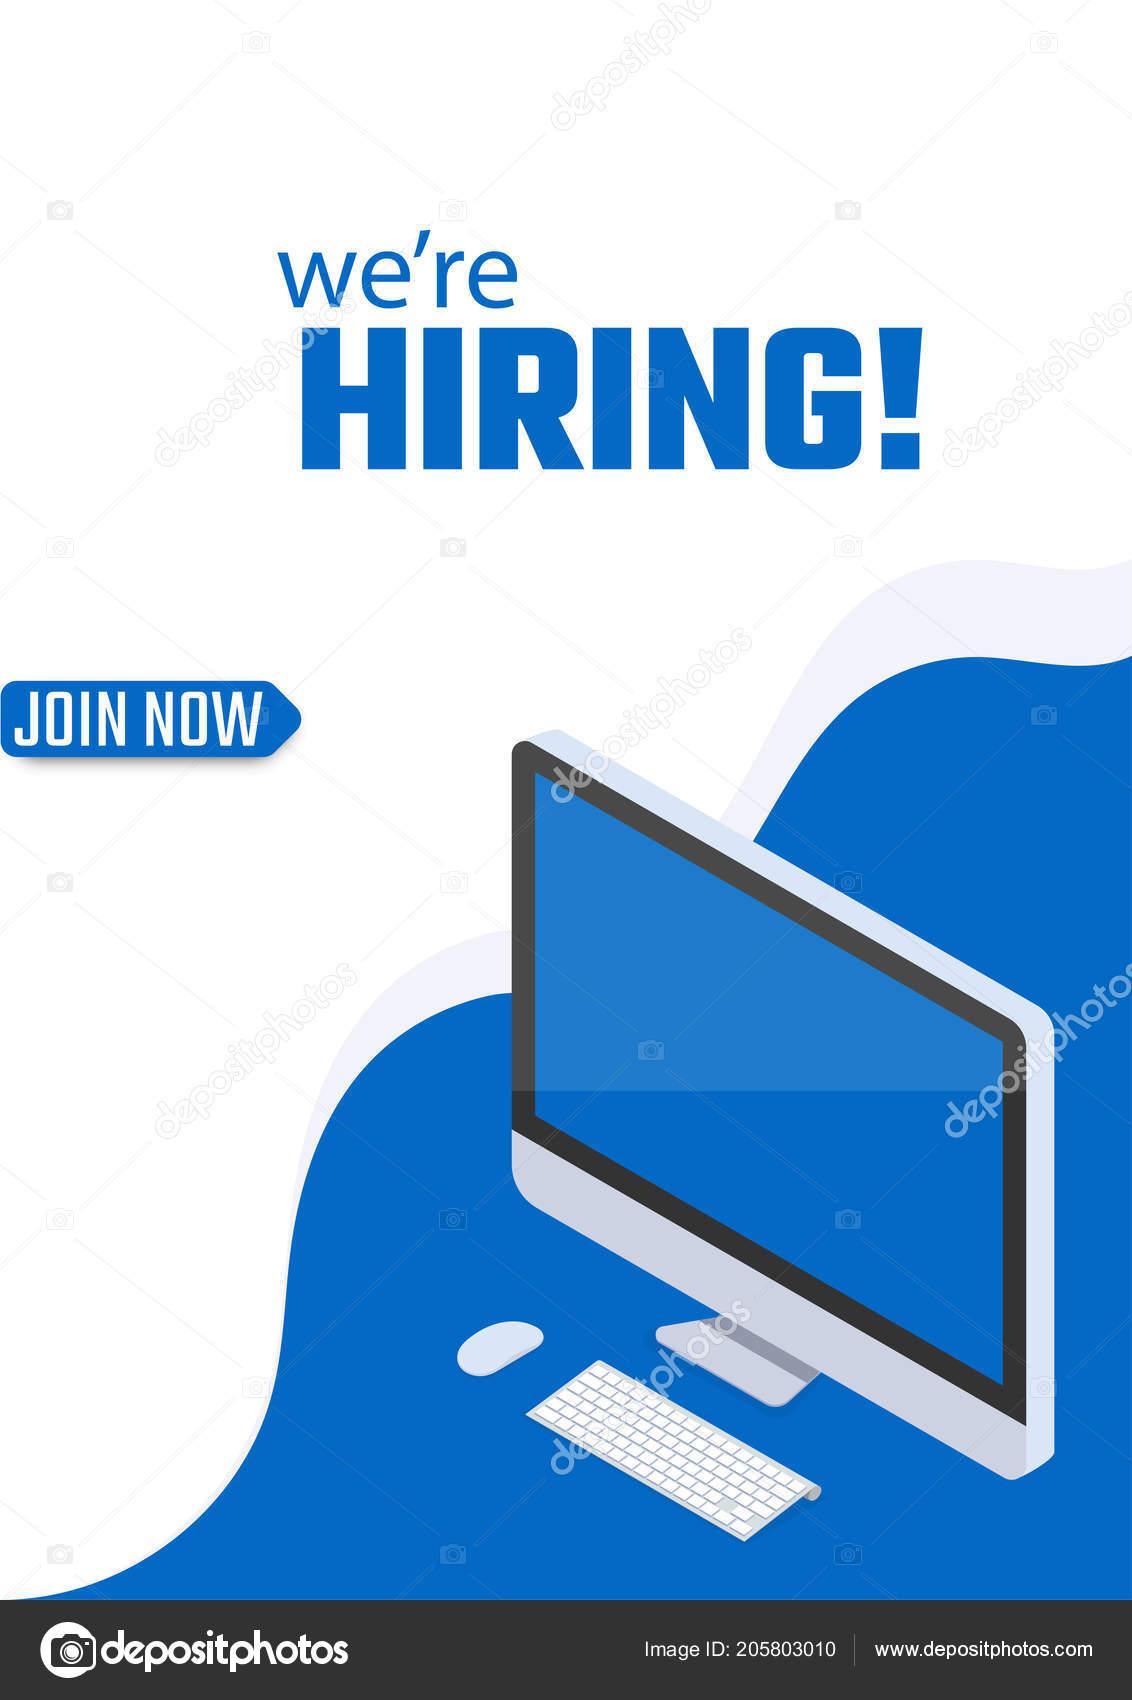 hiring join now poster template design job vacancy advertisement